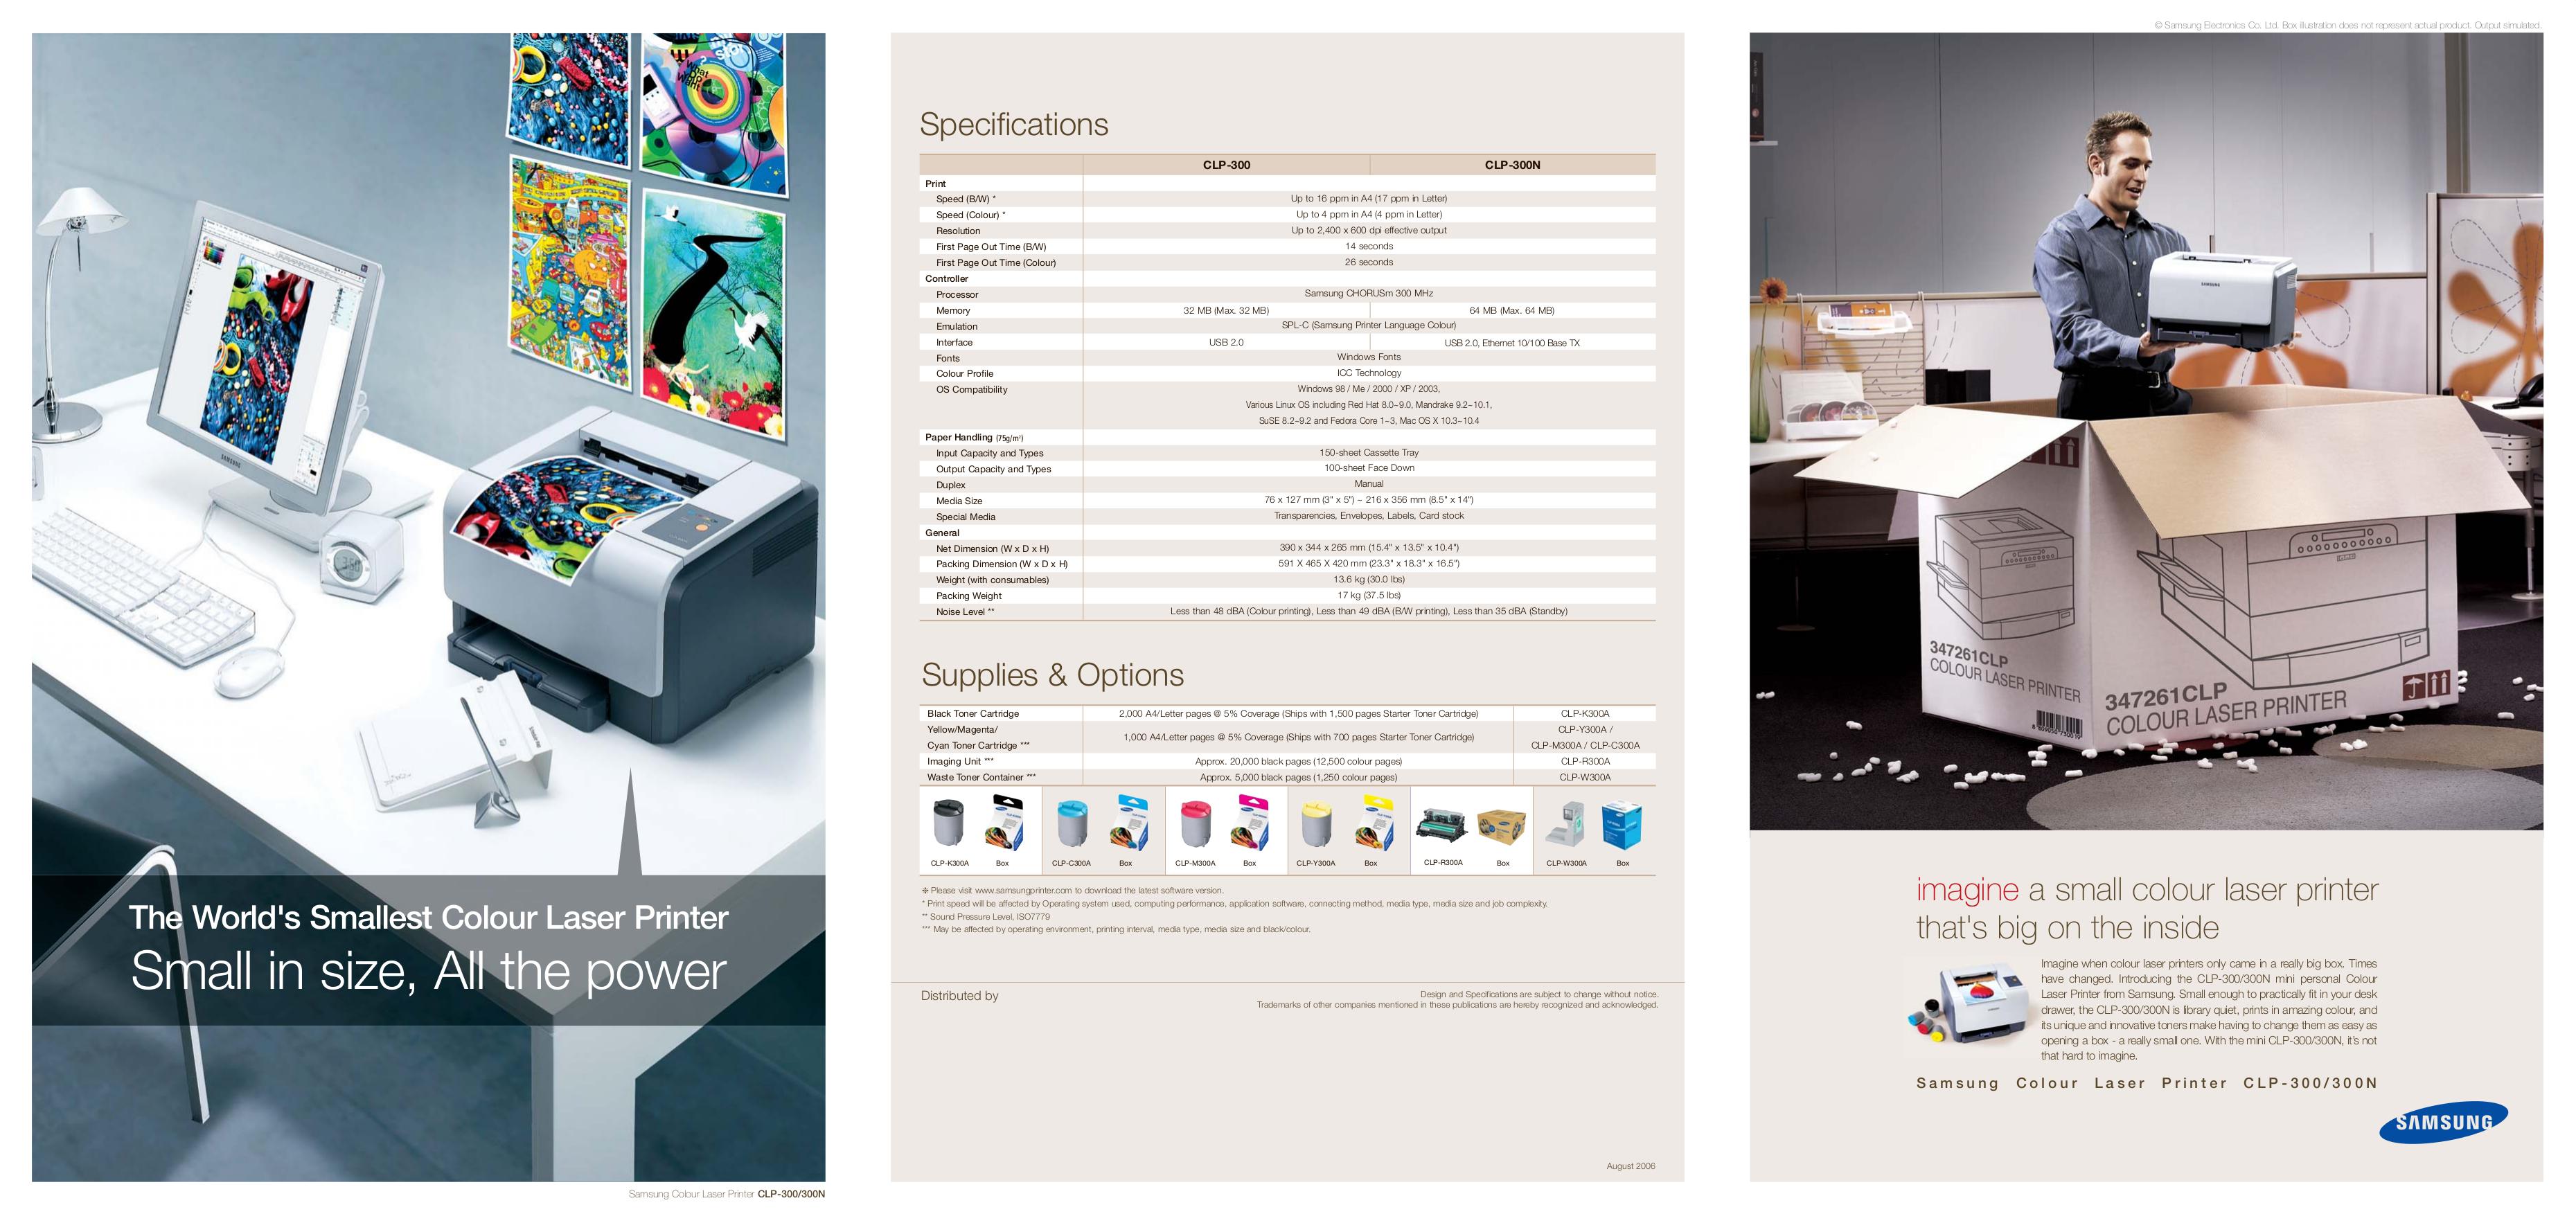 pdf for Samsung Printer CLP-300N manual